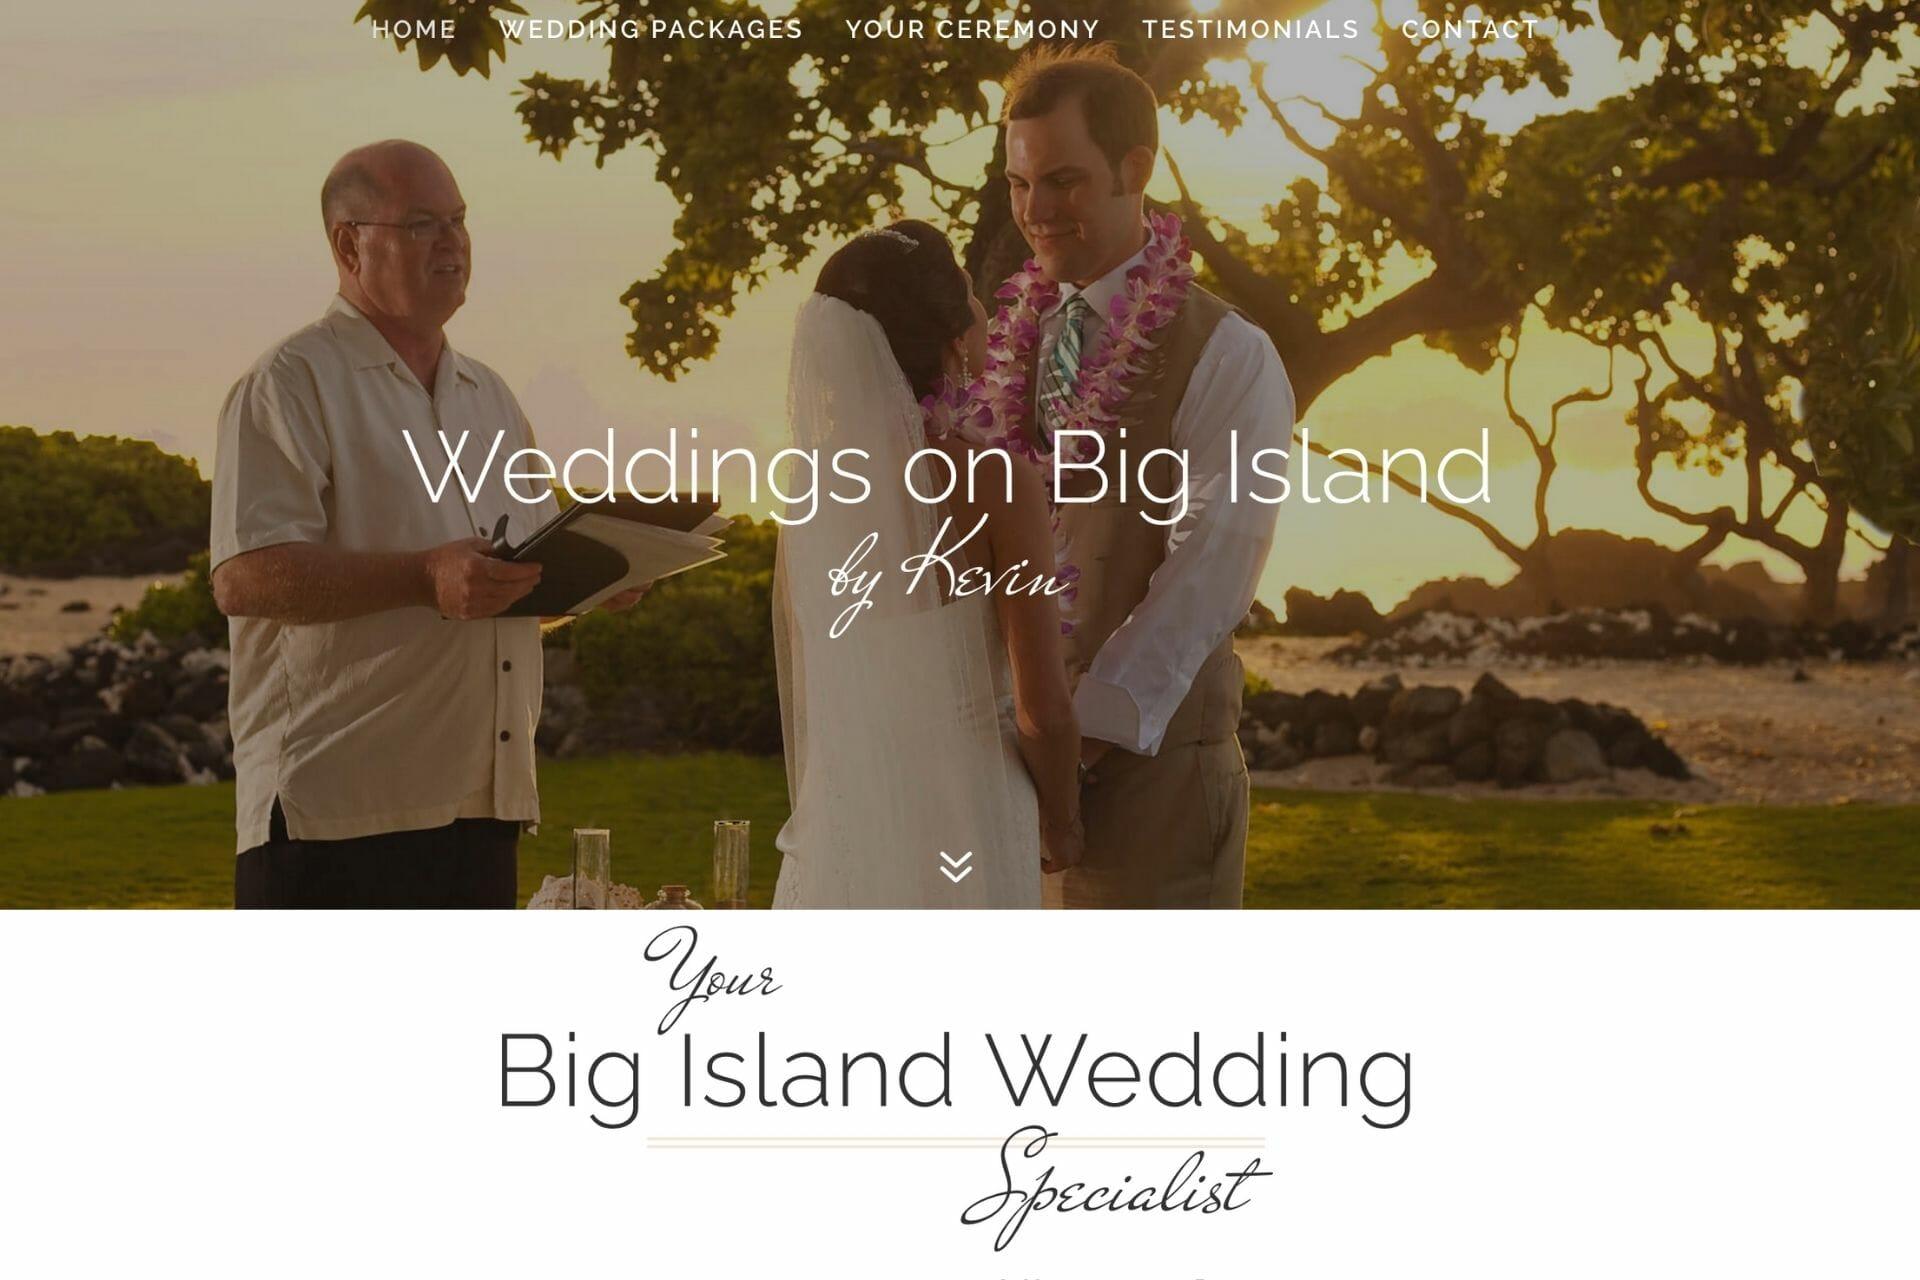 Home Page for Weddings on Big Island